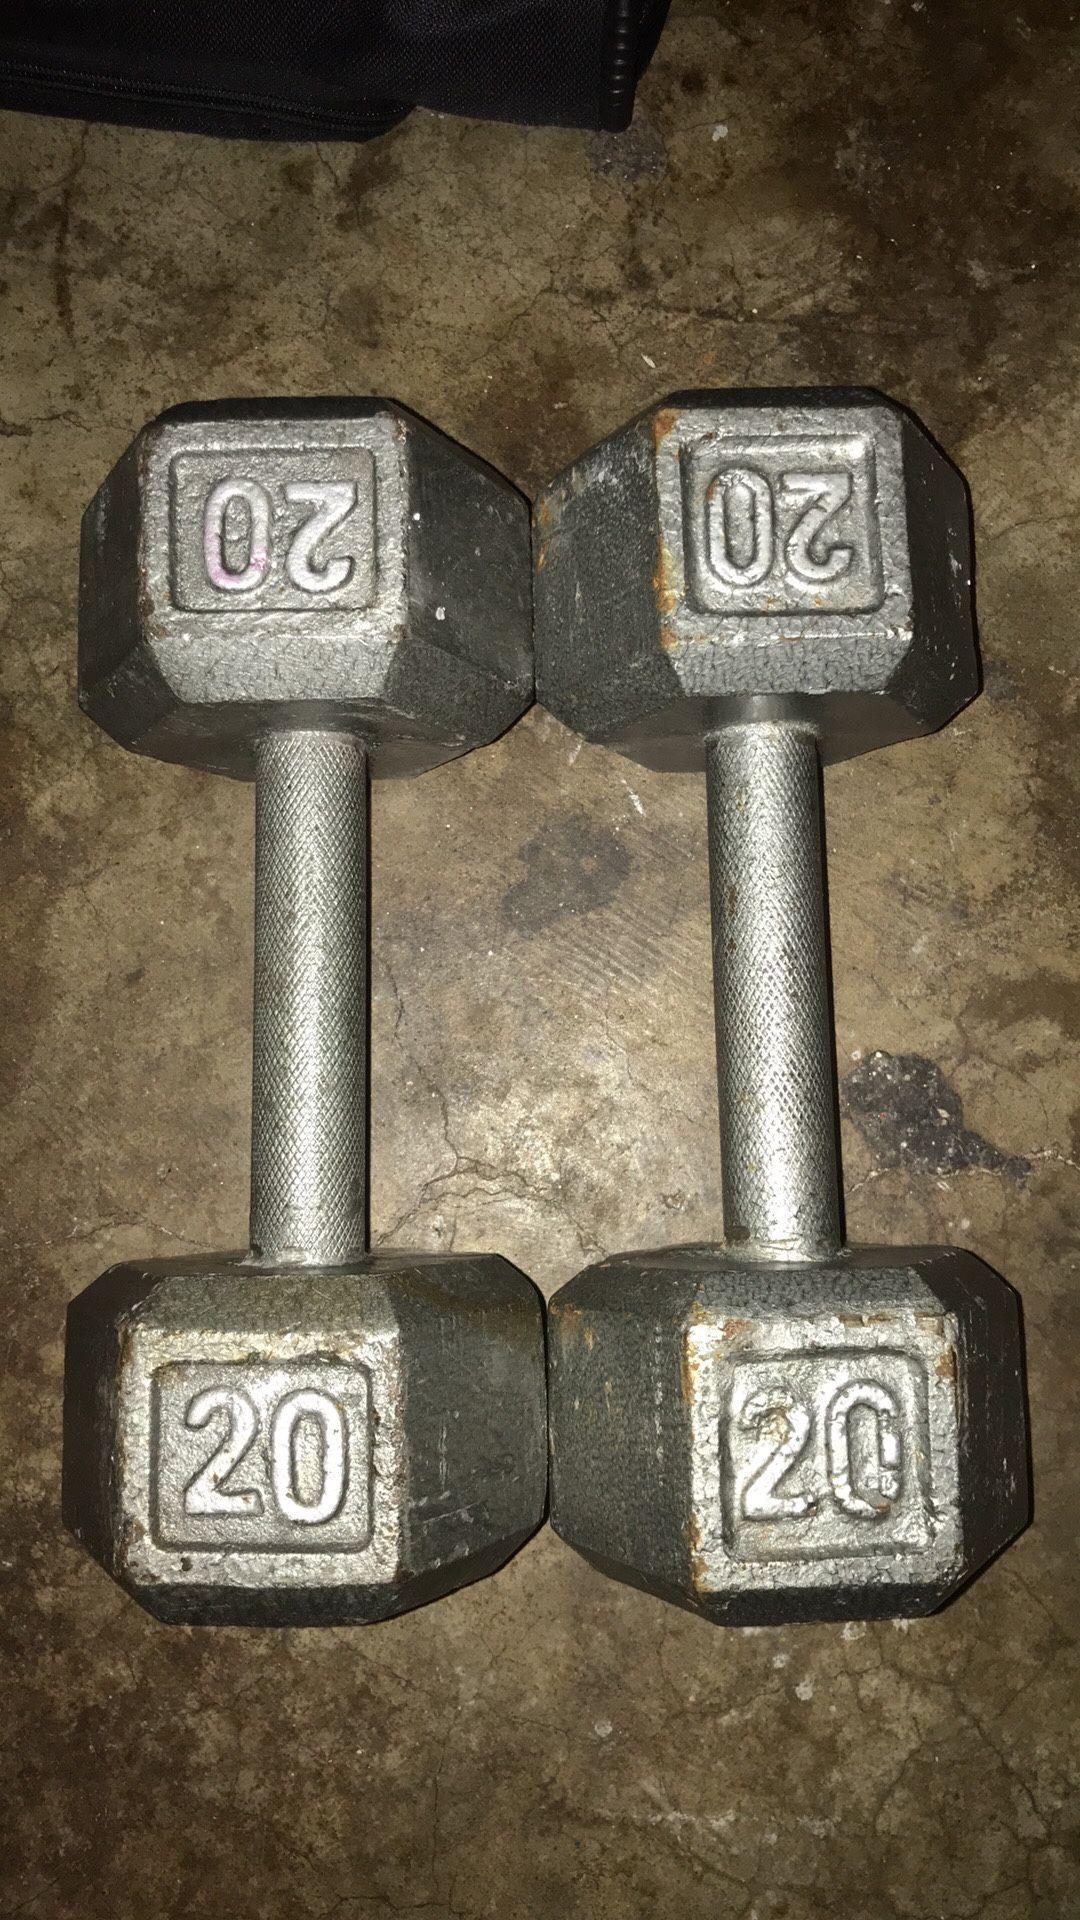 20 Pound Steel Dumbbells